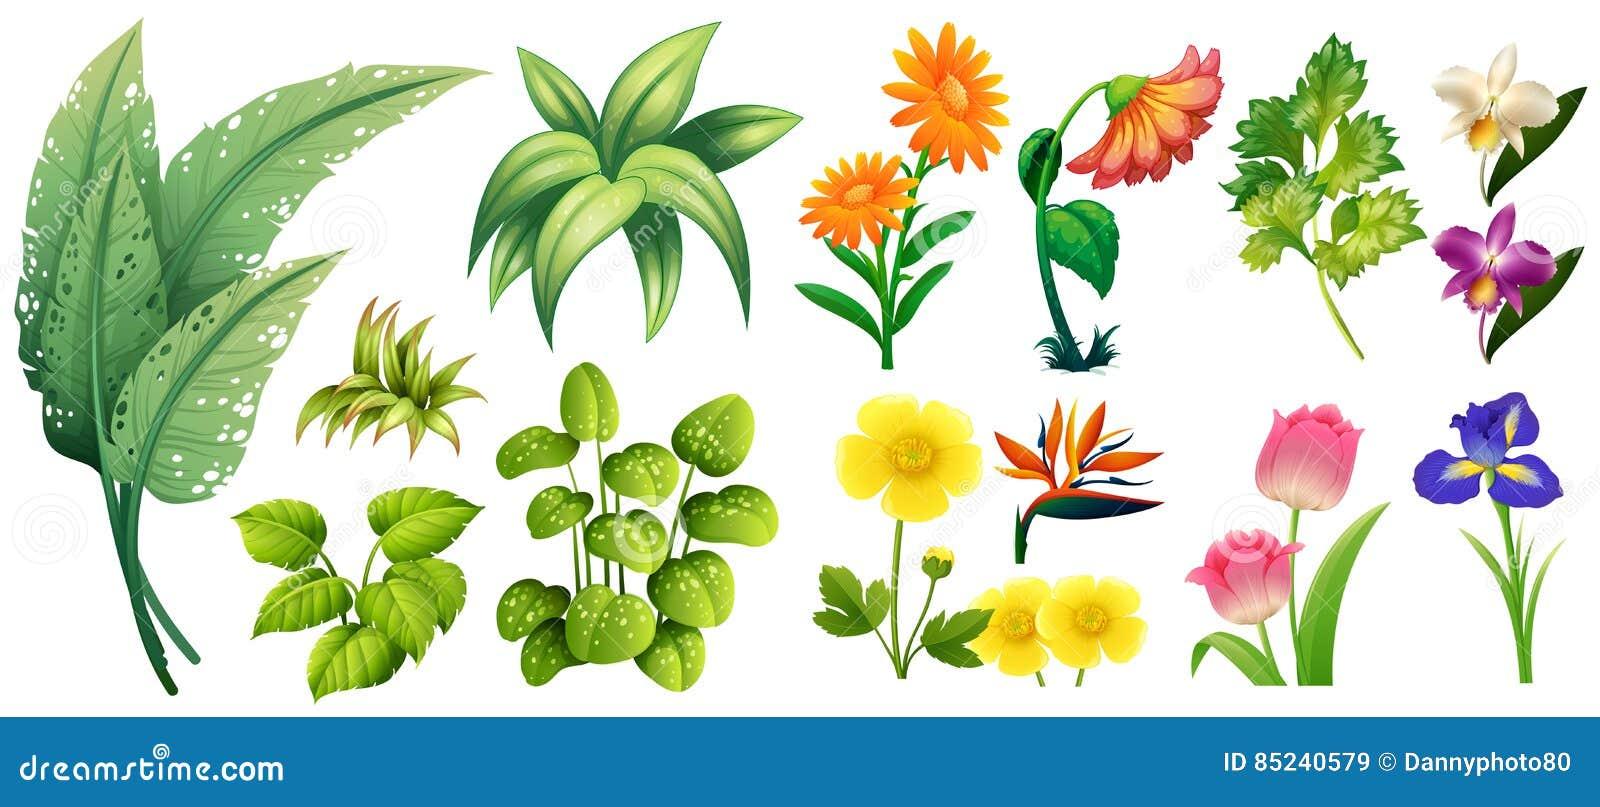 worksheet Different Types Of Leaves Worksheet different types of flowers and leaves stock illustration leaves